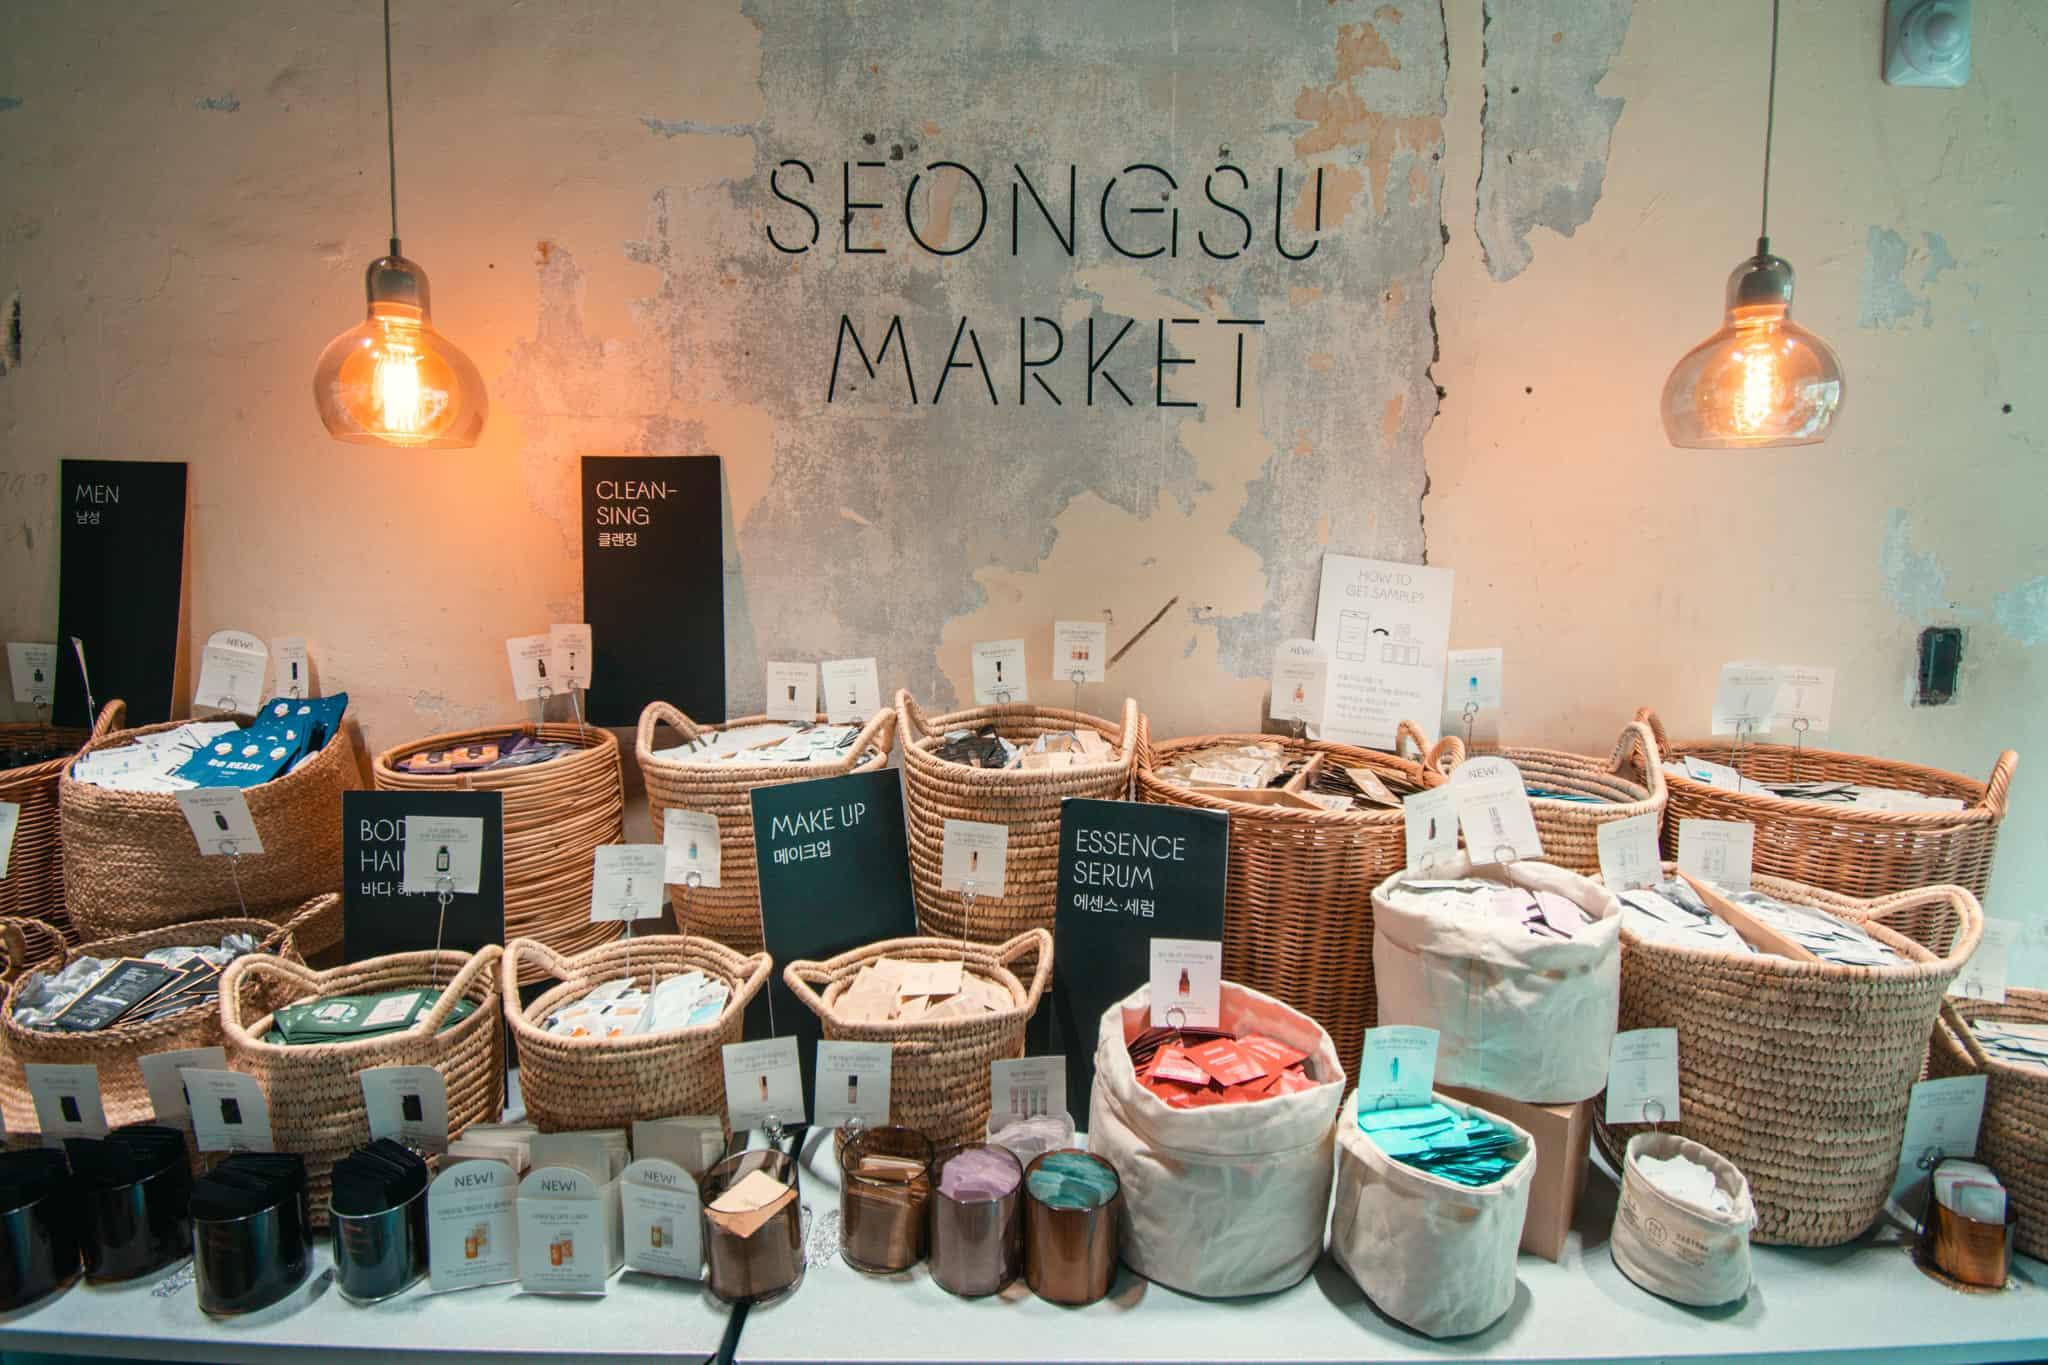 Seongsu Market